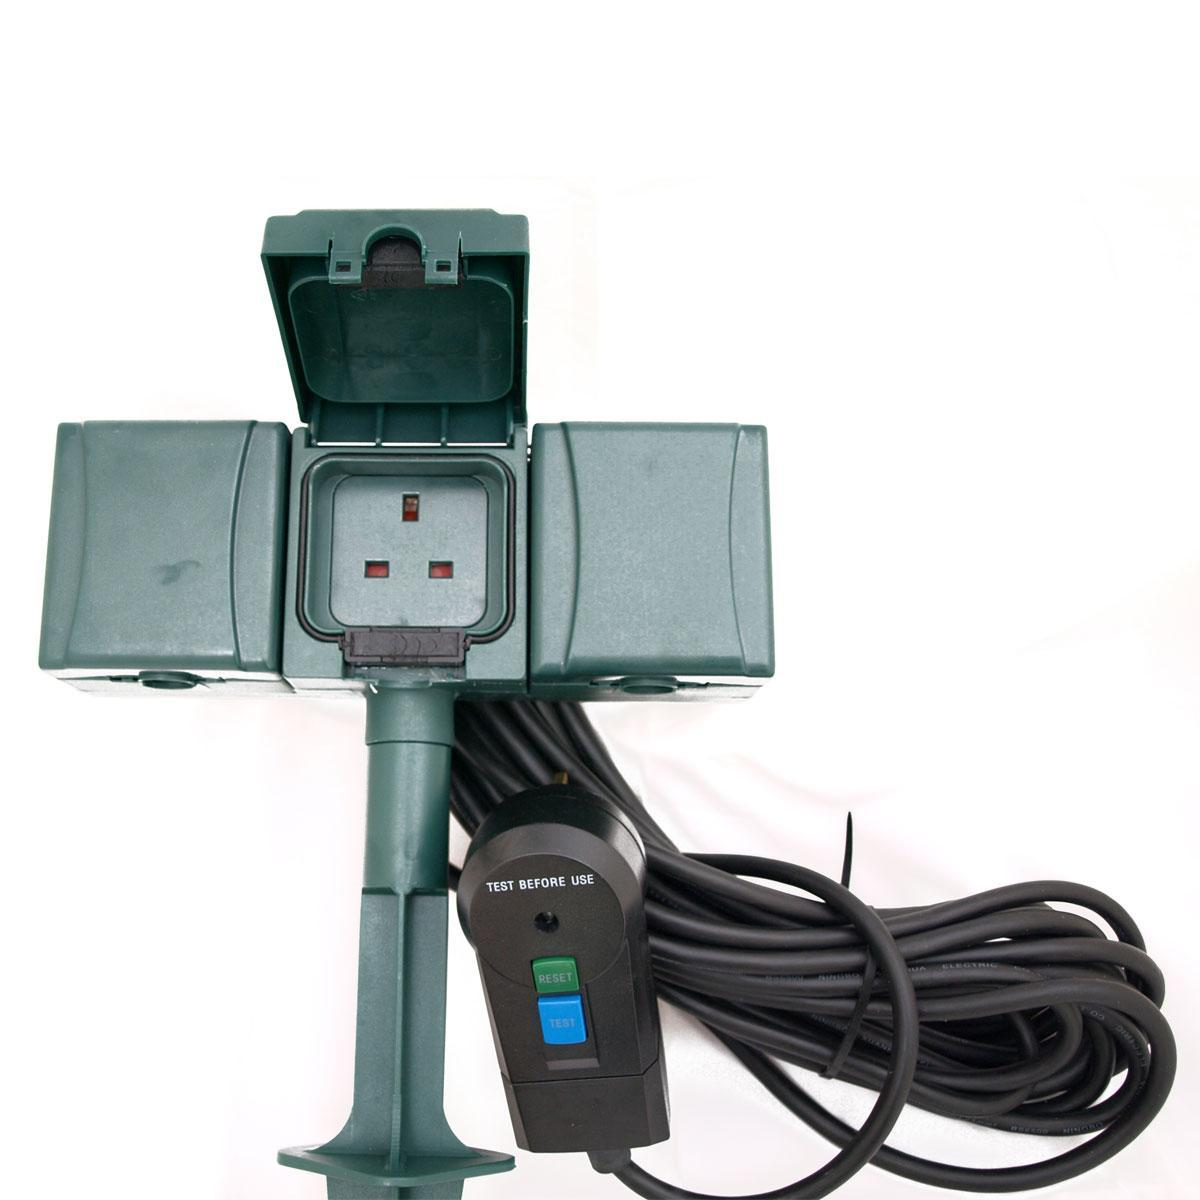 Patio Heater Accessories Uk Rcd Powerspike Safety Garden Sockets Heat  Outdoors